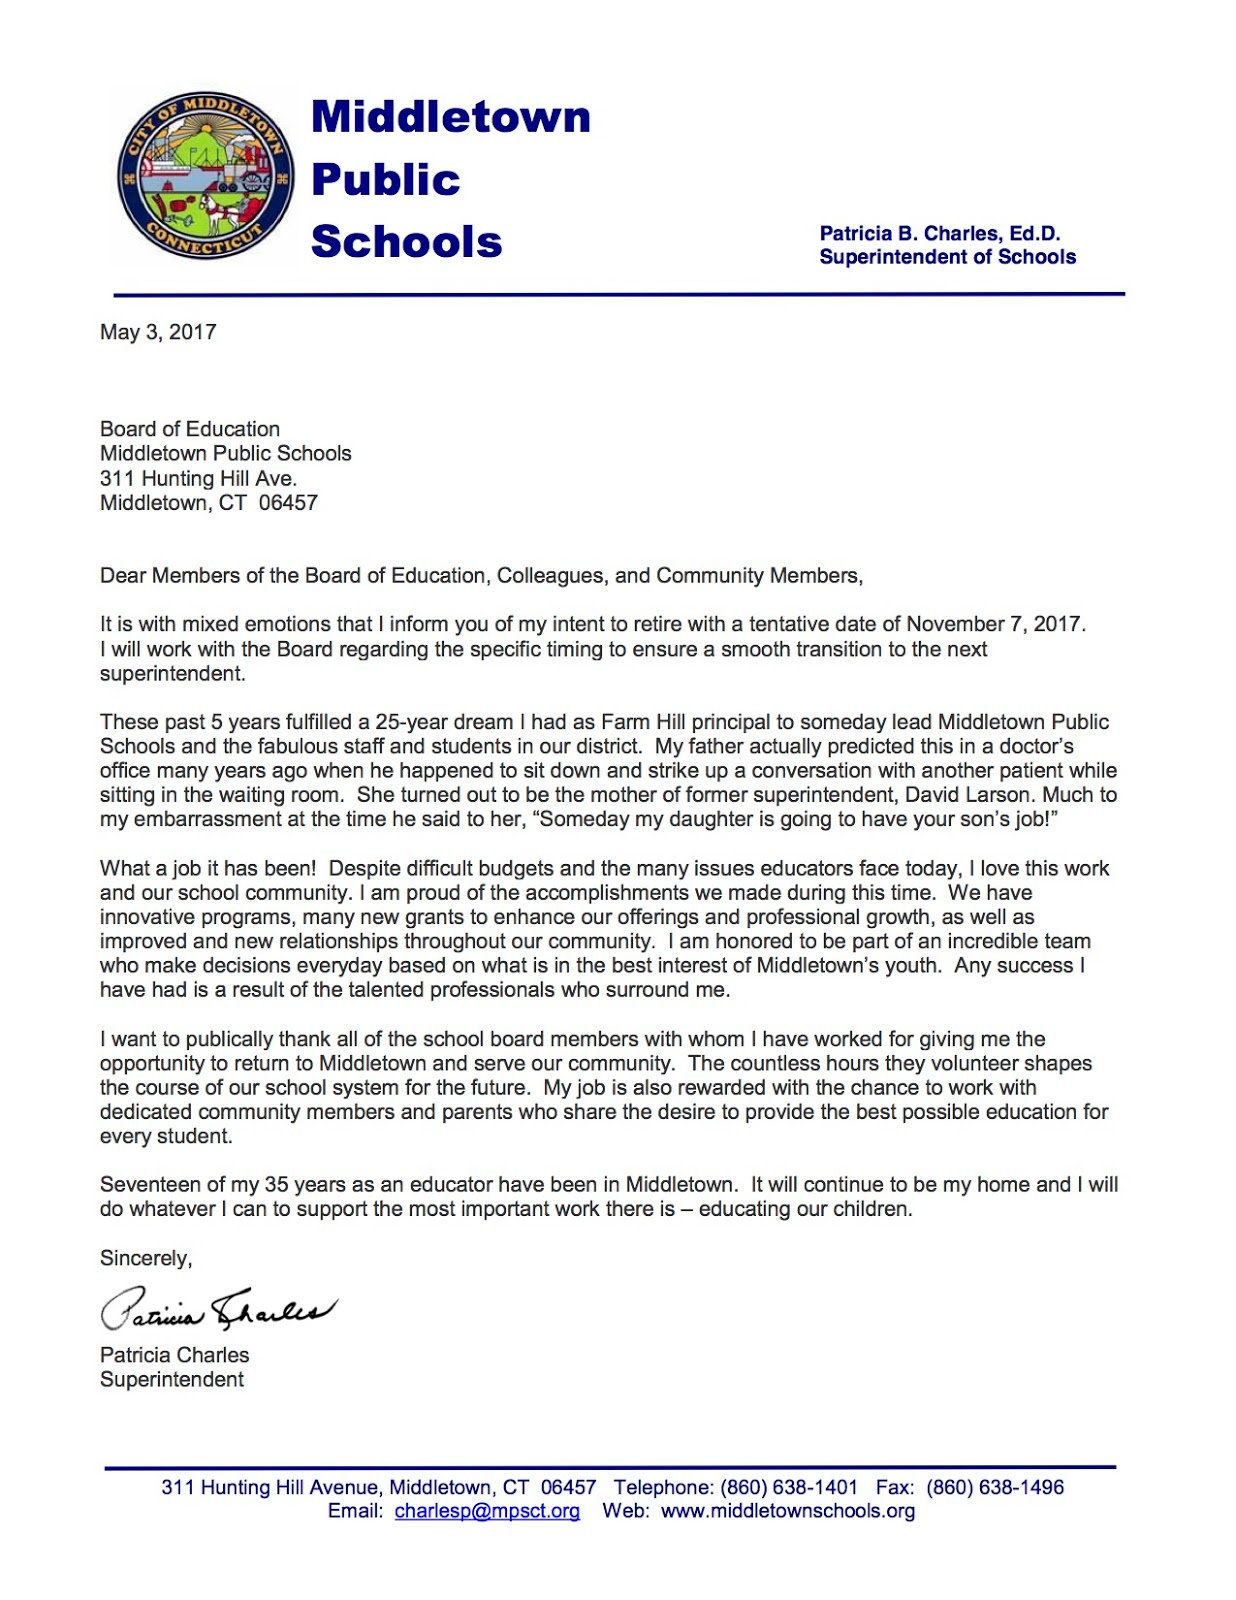 letter of intent to retire mersn proforum co